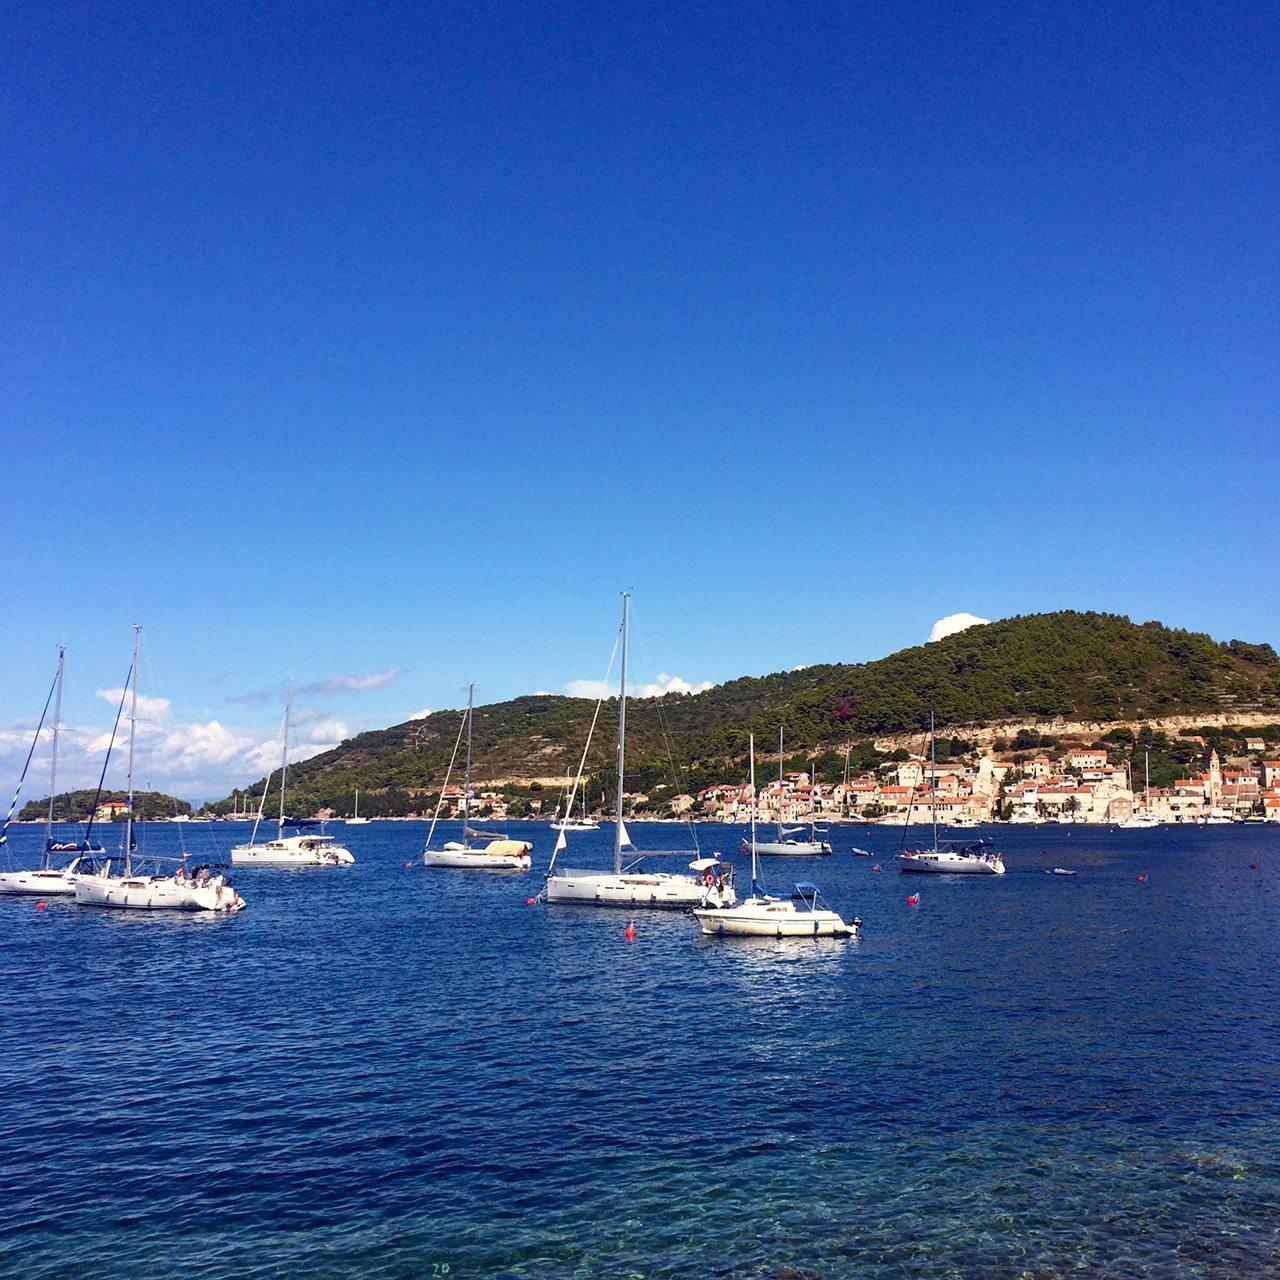 MedSailors Croatia Seaview